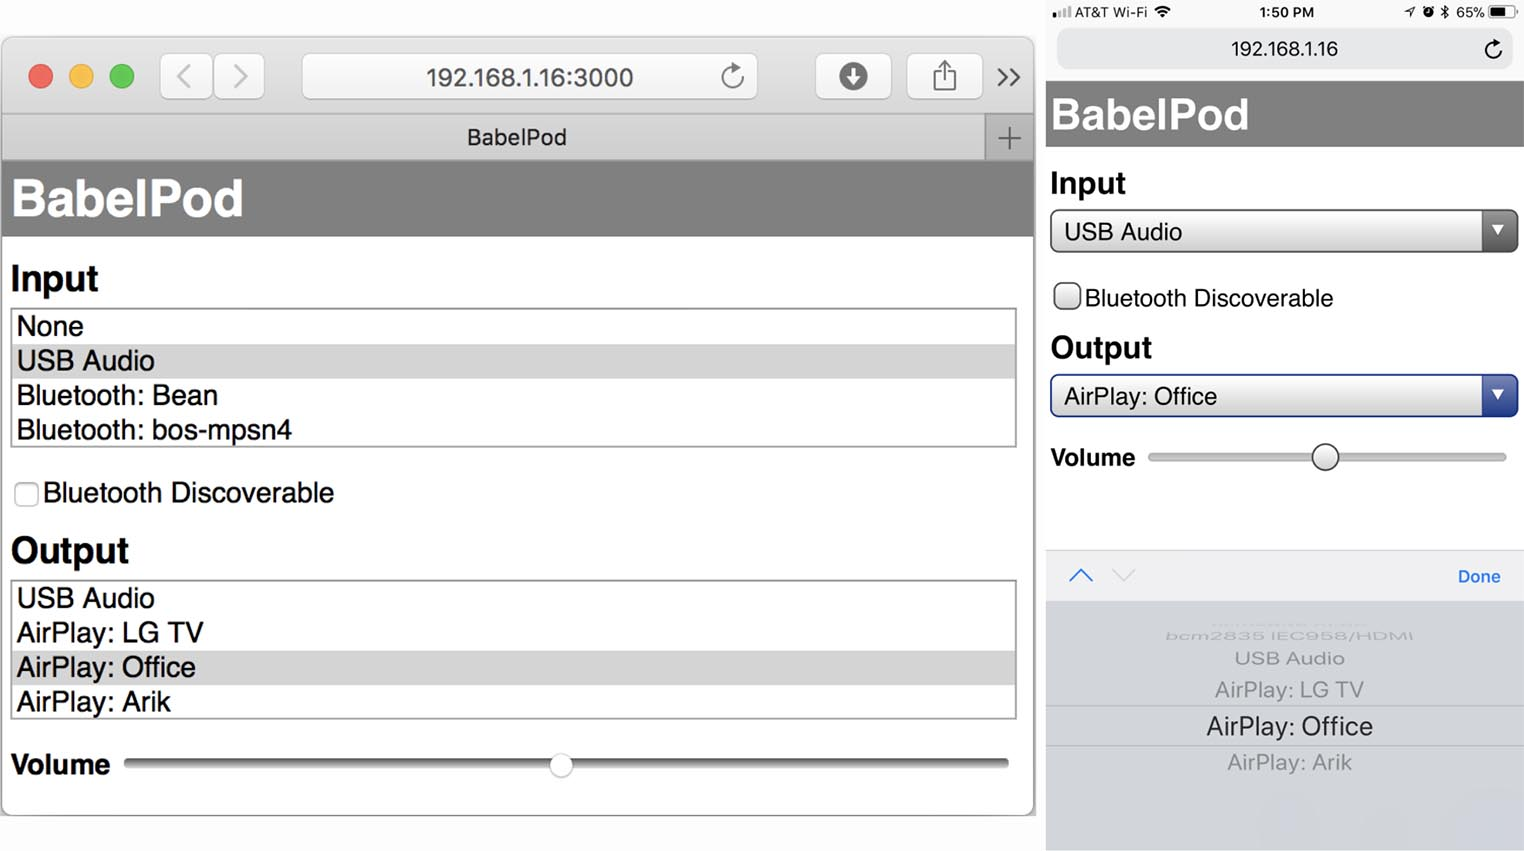 Babelpod interface